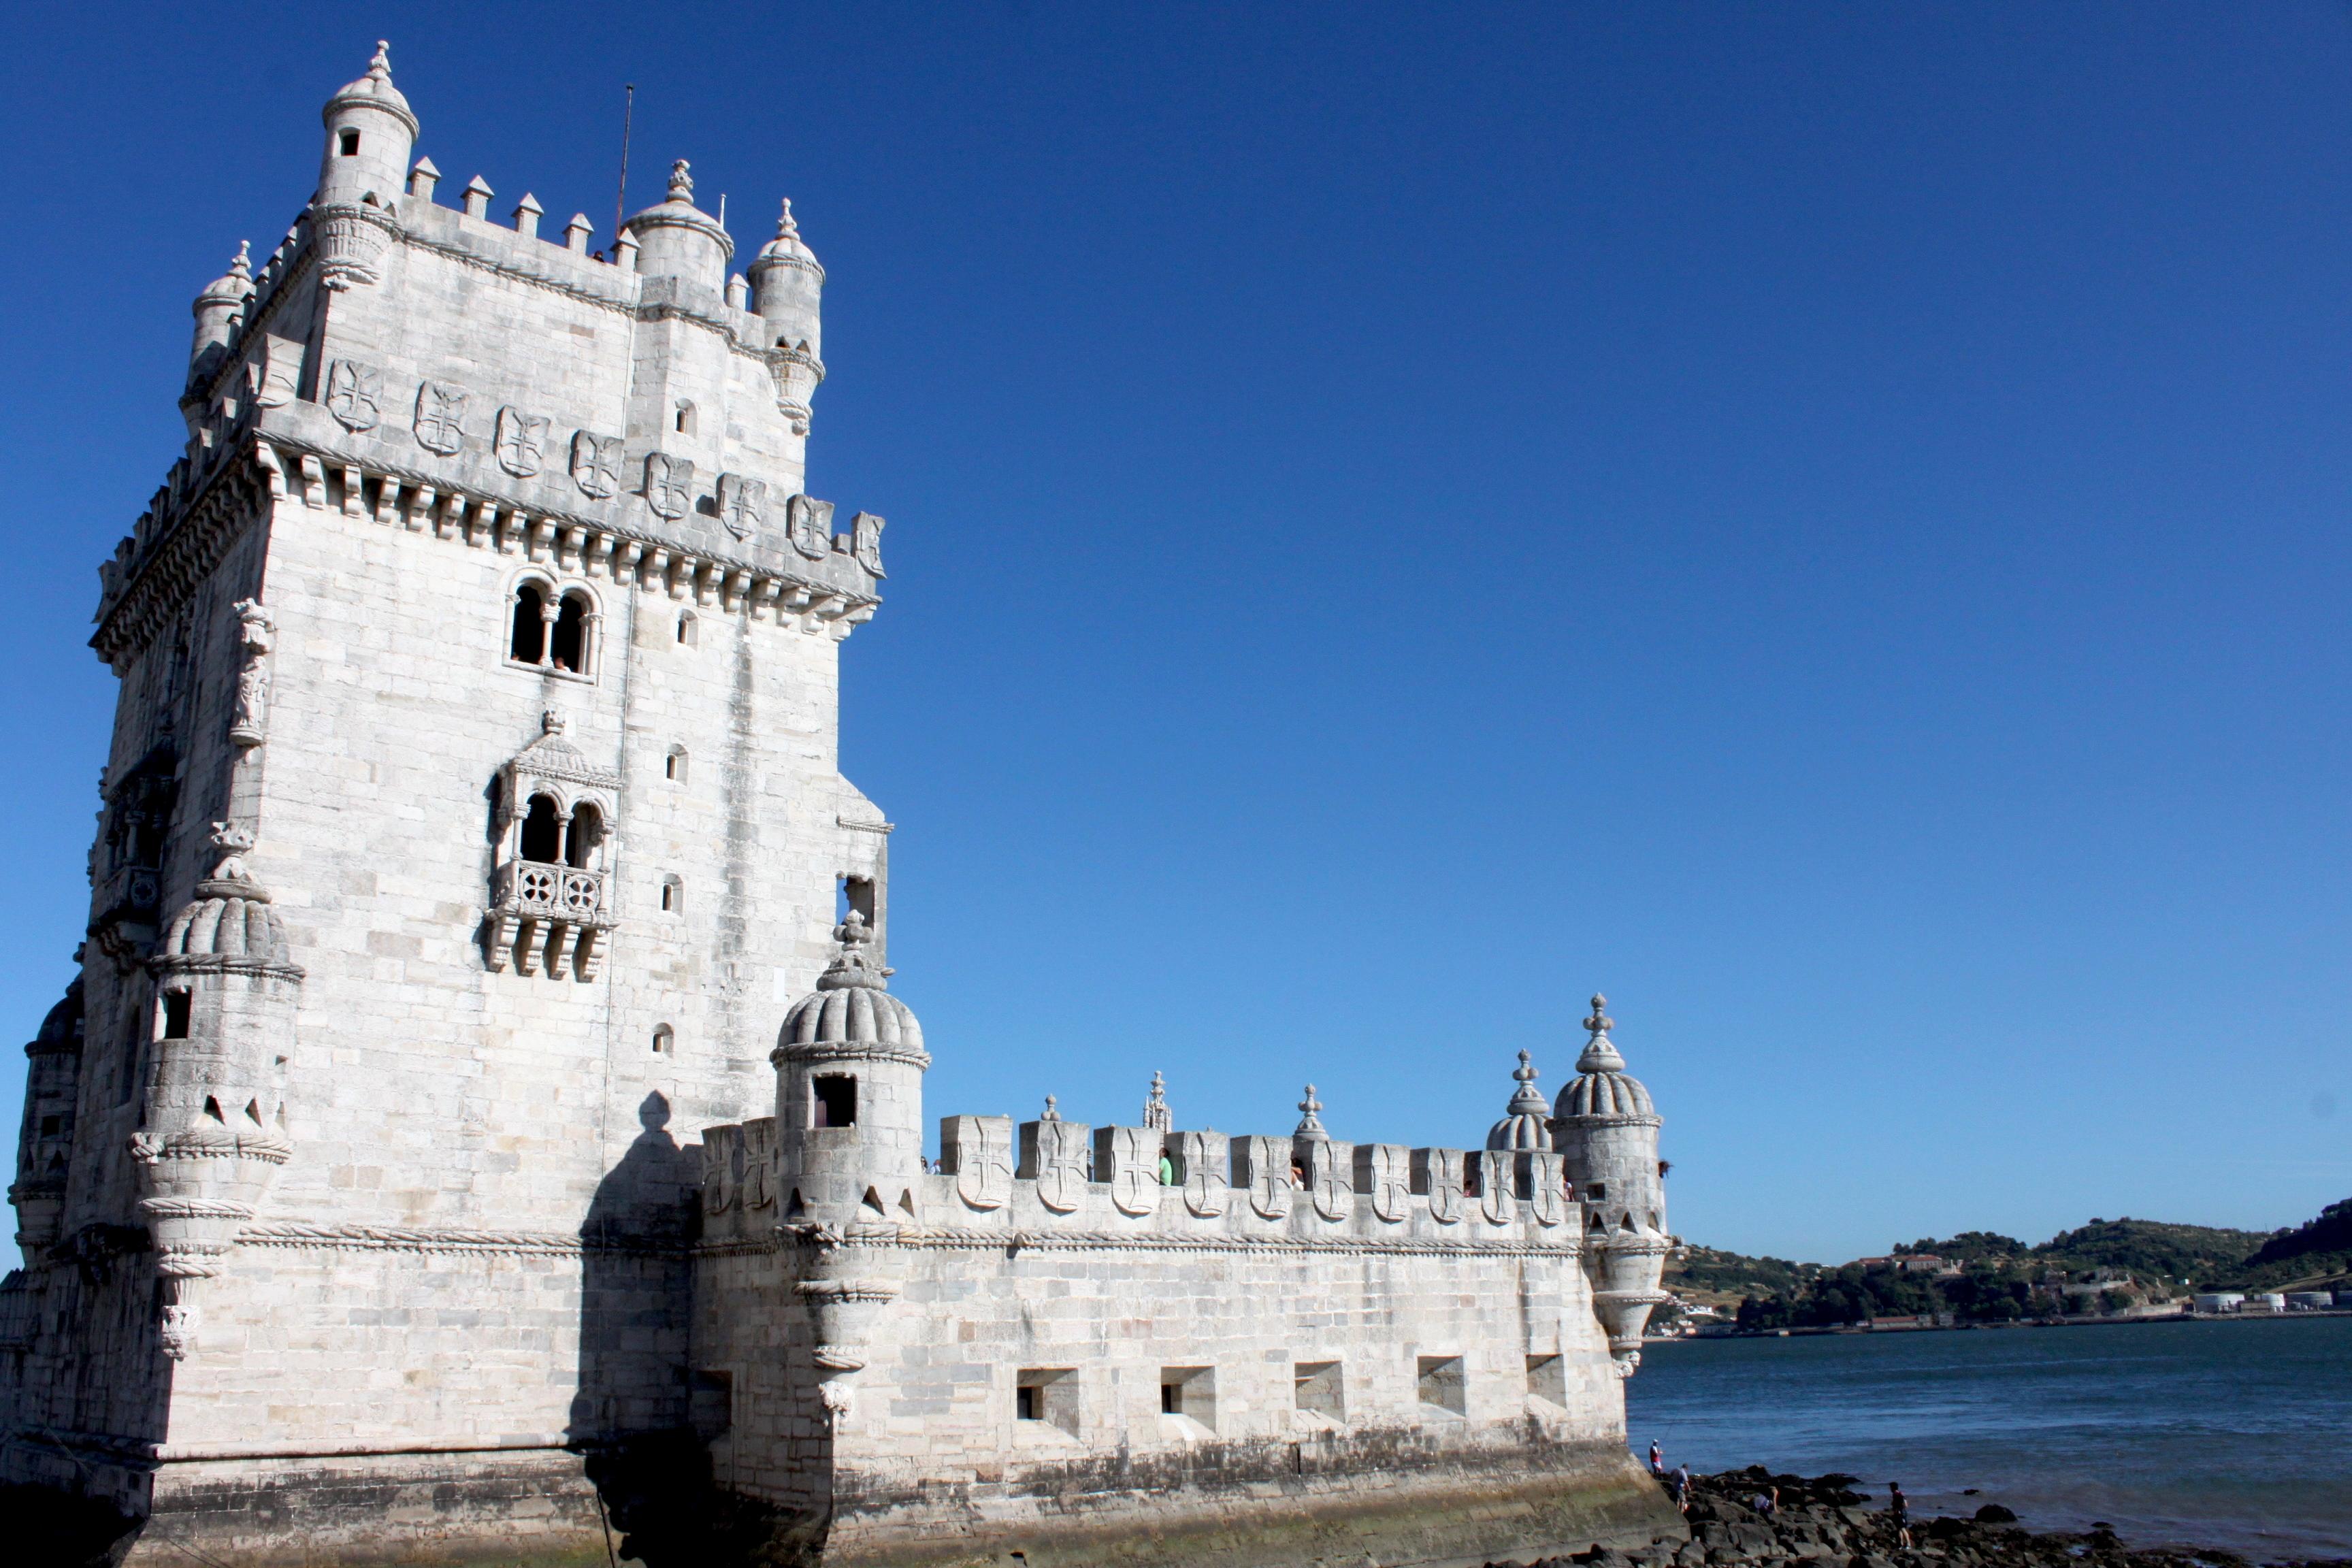 La Torre di Belem, sovrana